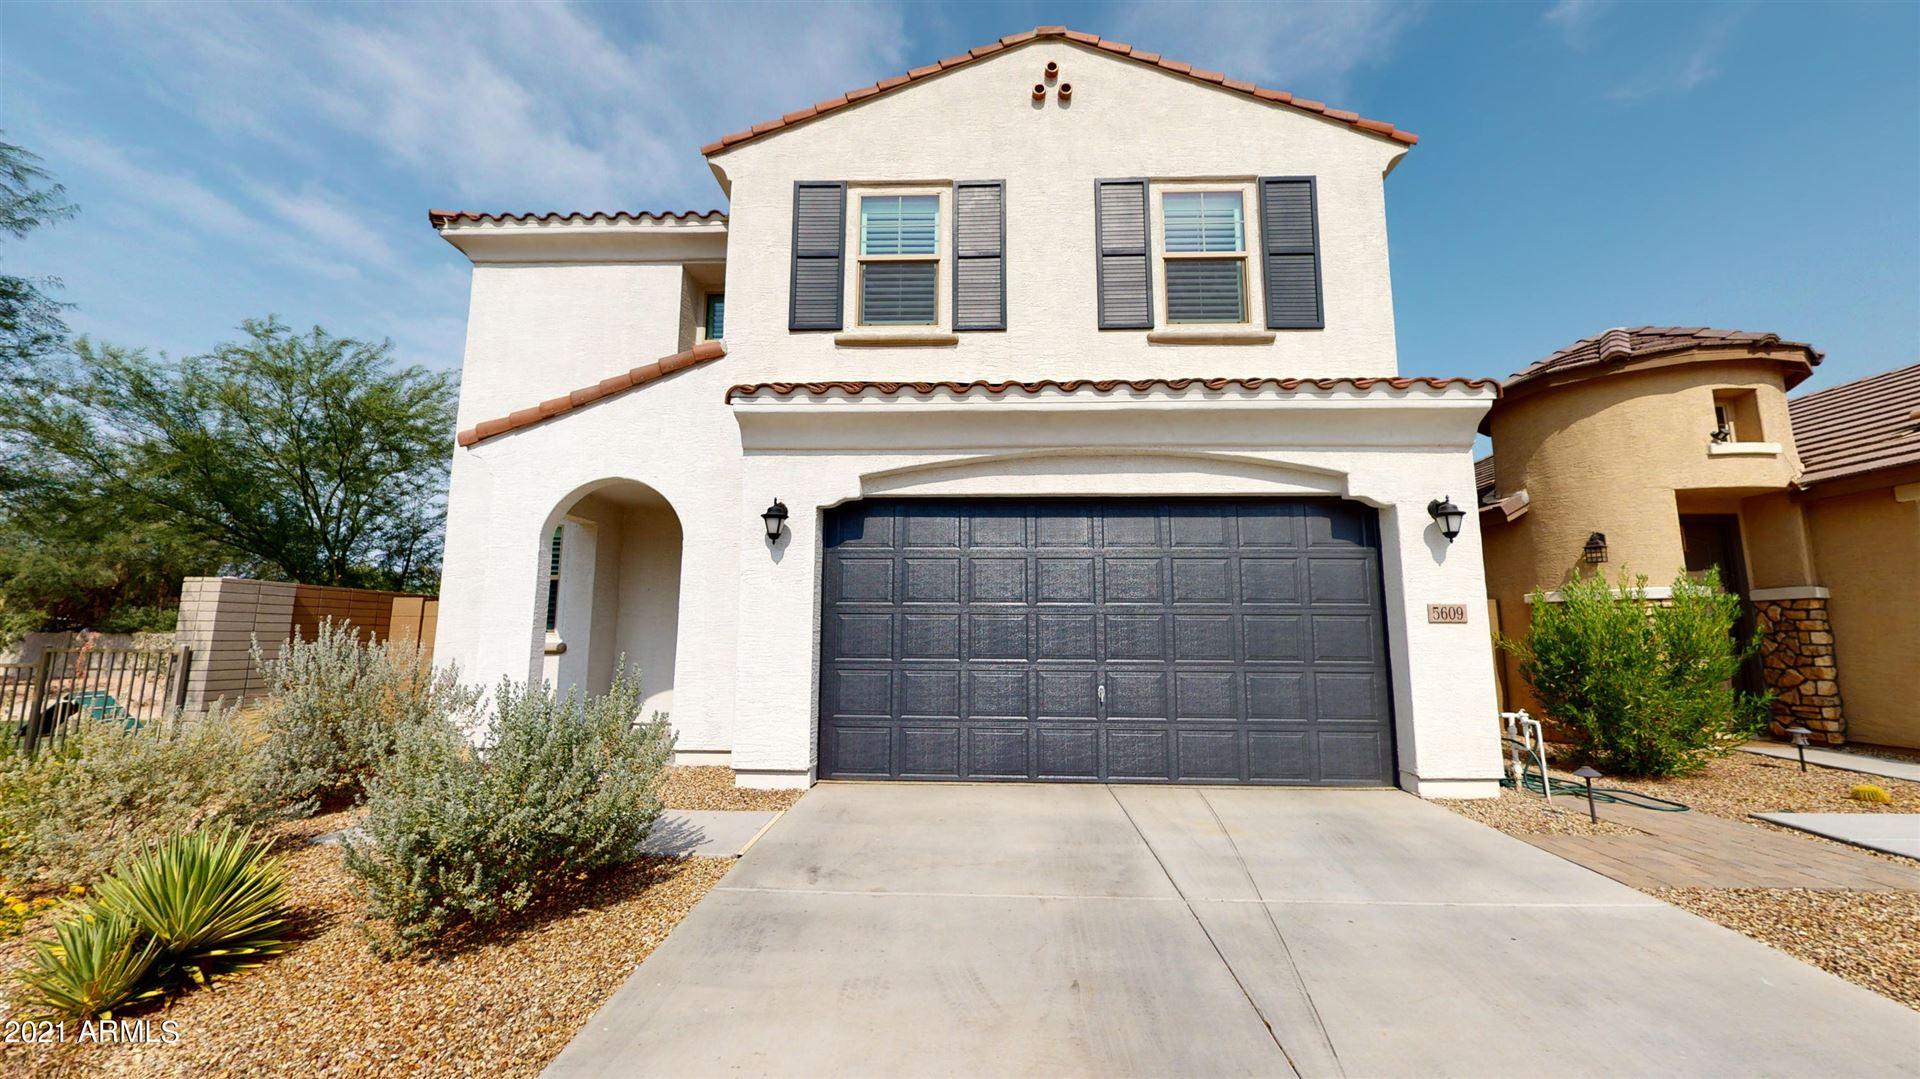 5609 S 29TH Place, Phoenix, AZ 85040 - MLS#: 6265767